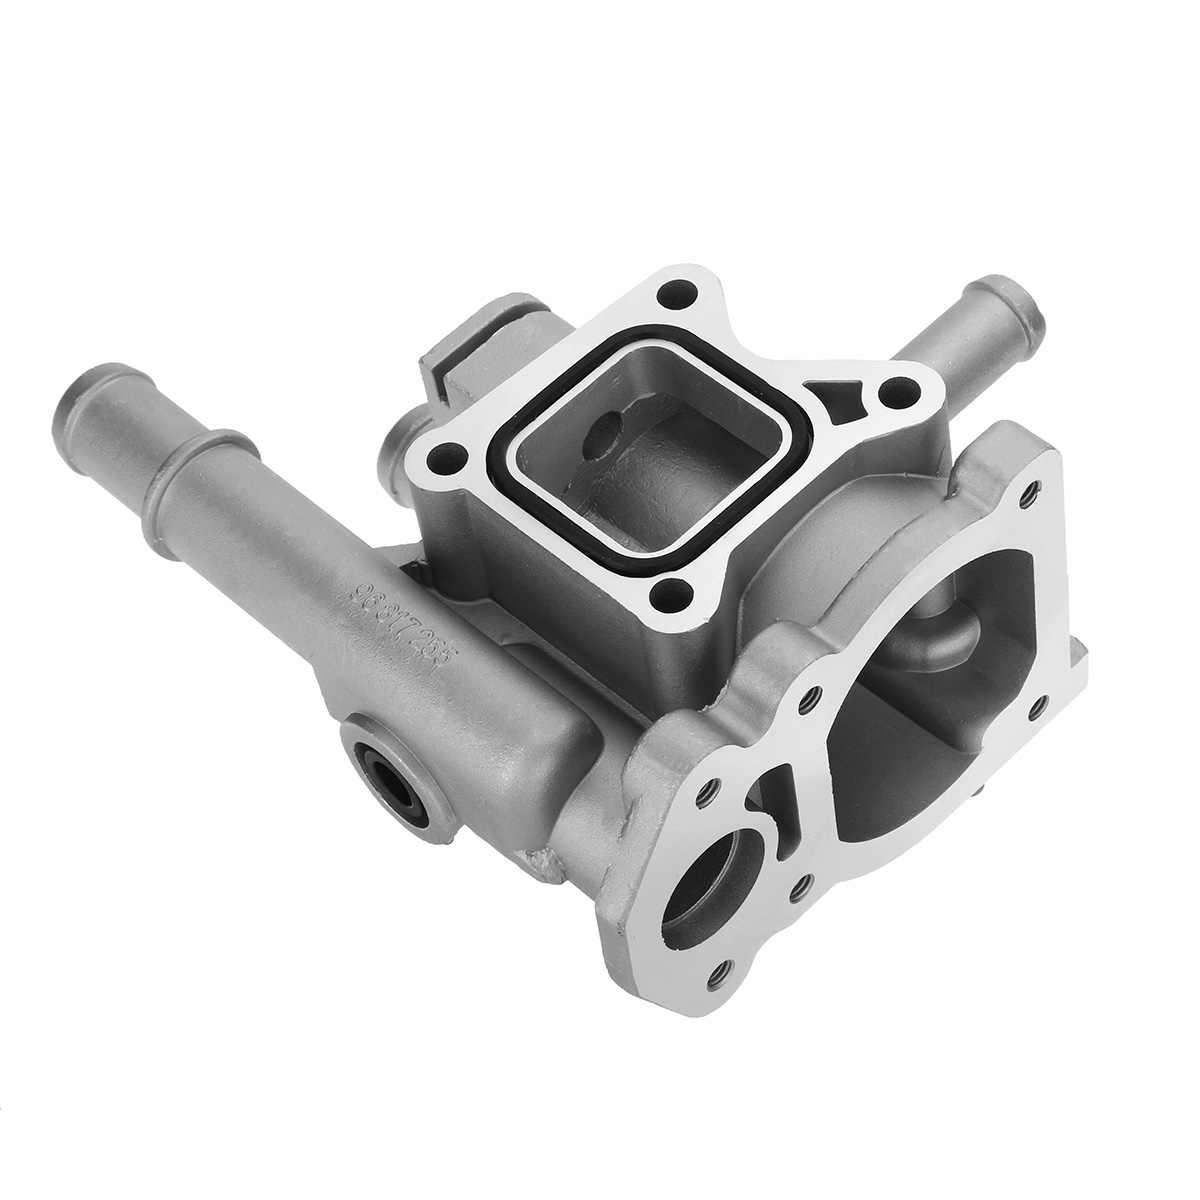 Alüminyum termostat konut kapak için Chevrolet Chevy Cruze Aveo Orlando Opel Astra Zafira Signum 96984103 96984104 96817255